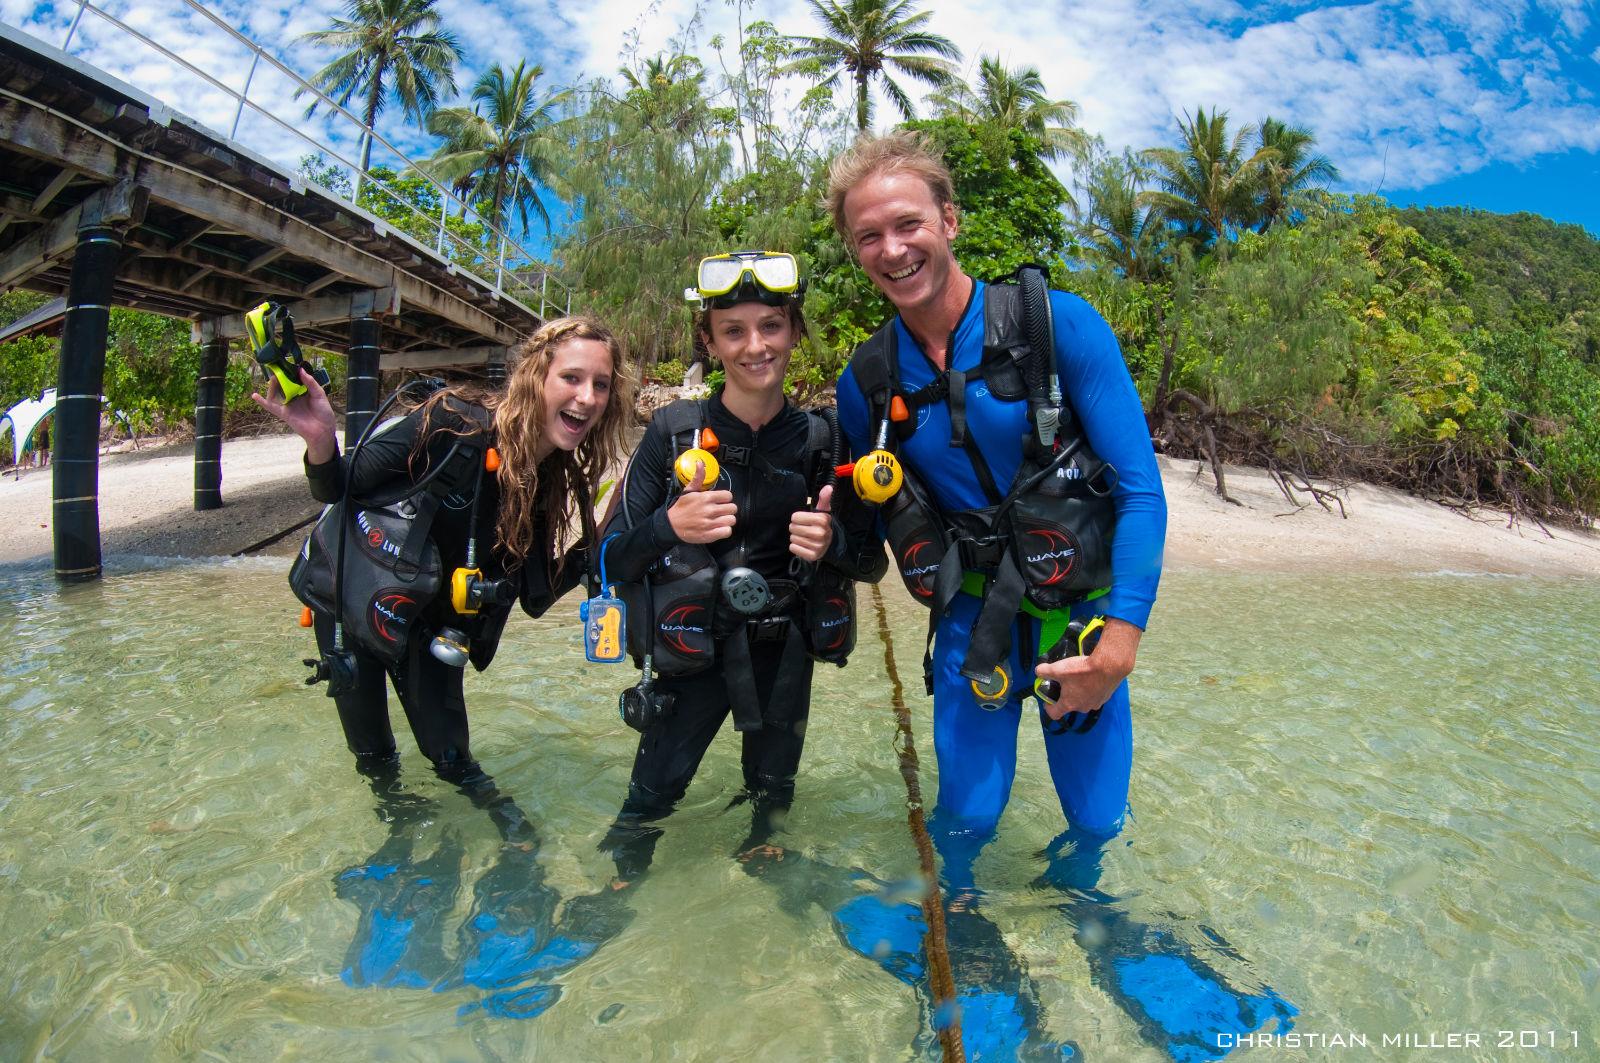 fitzroy-island-resort-great-barrier-reef-australia-hotel-accommodation (1).jpg